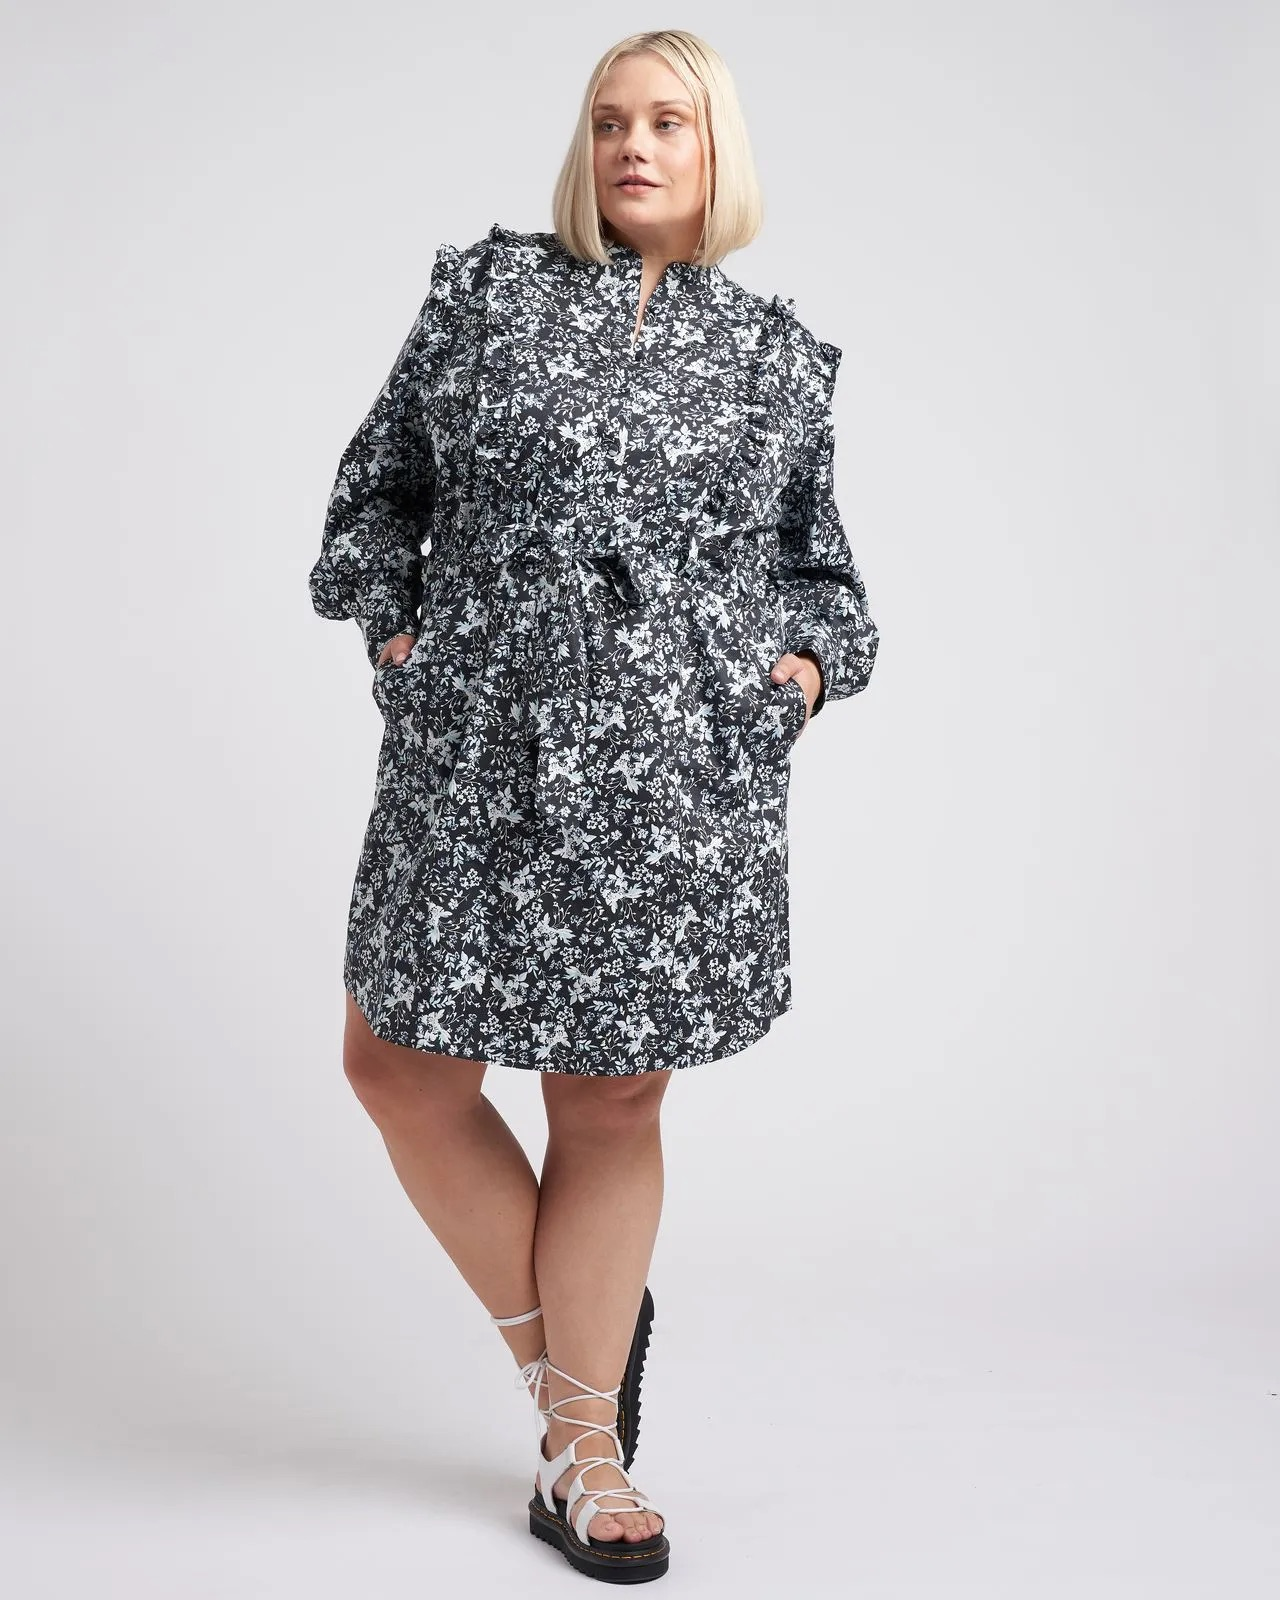 Primrose Ruffle Dress Erdem x Universal Standard